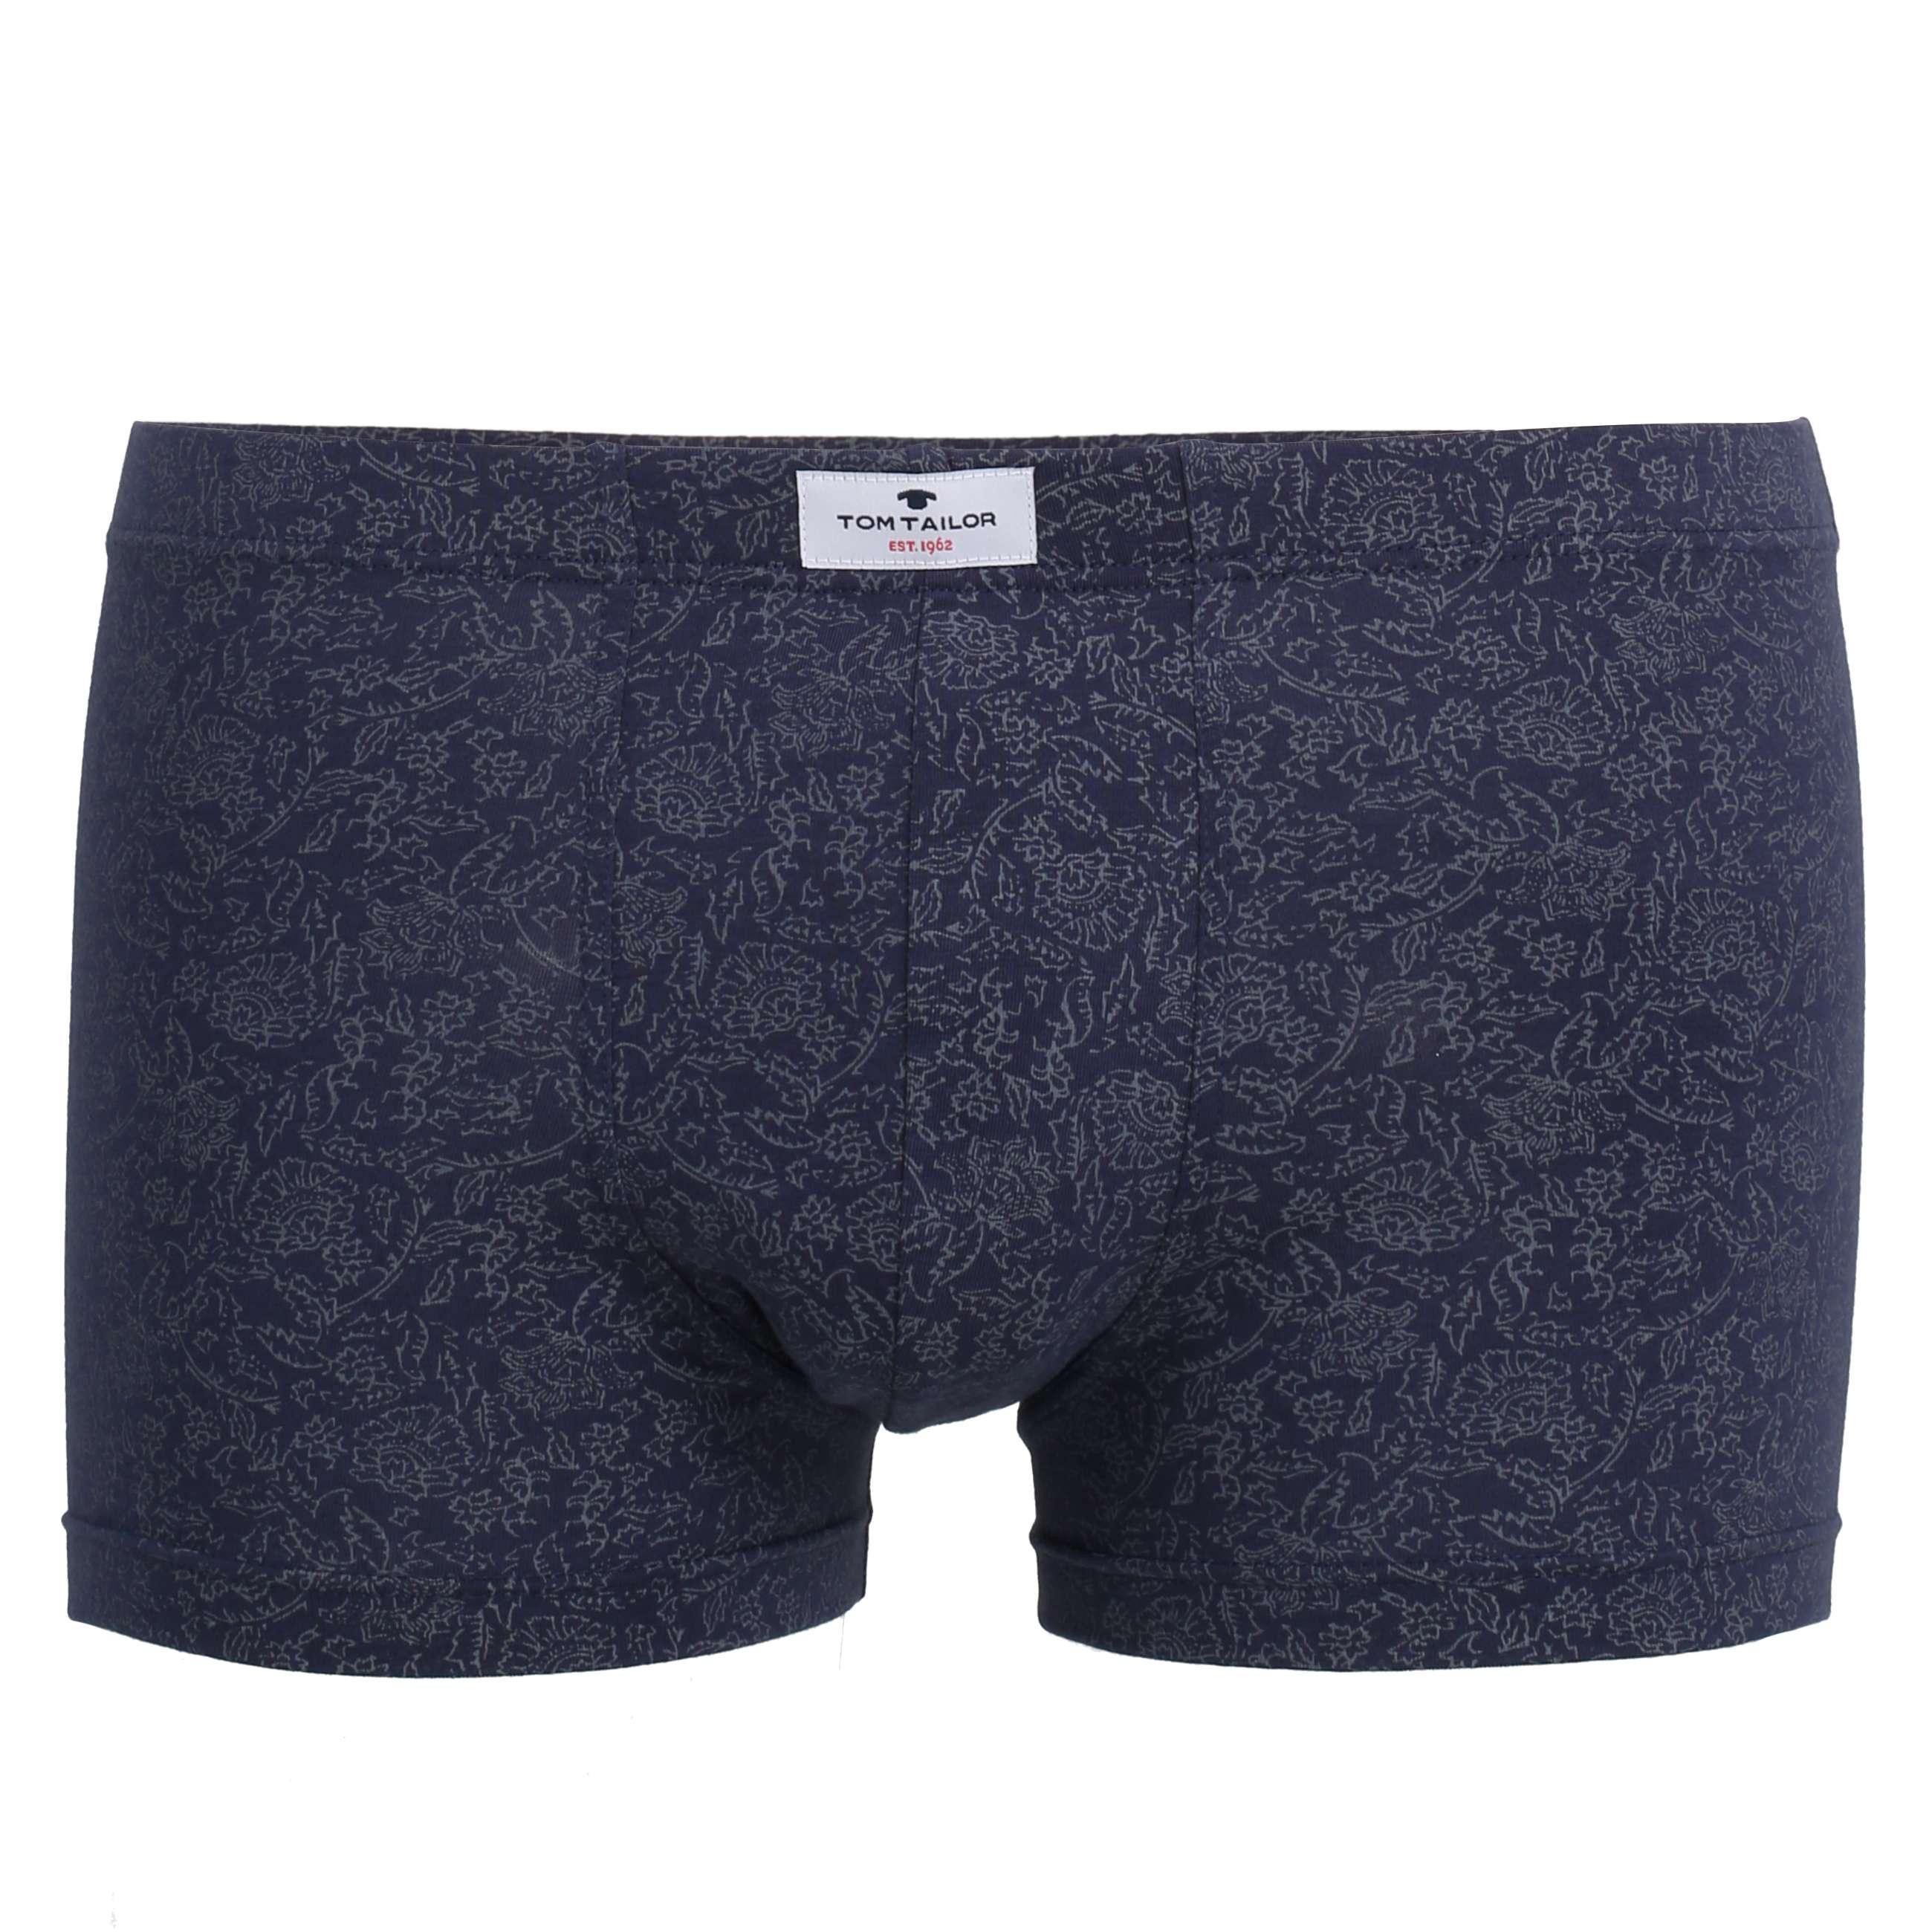 tom tailor herren pants unterhose blau. Black Bedroom Furniture Sets. Home Design Ideas